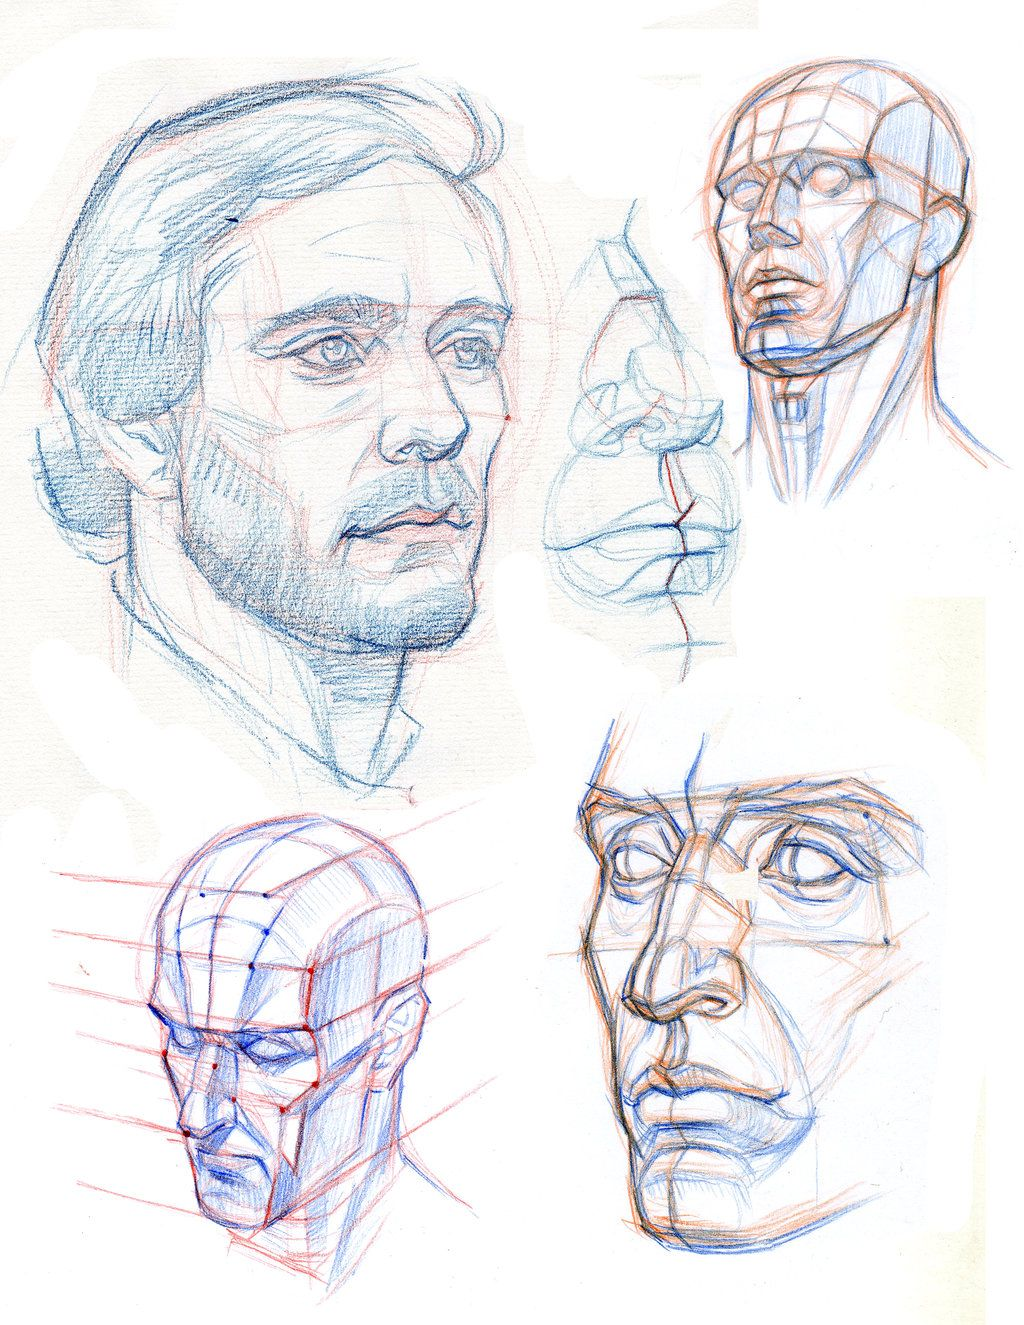 Cabeza | Pinturas | Pinterest | Anatomía, Dibujo y Dibujar